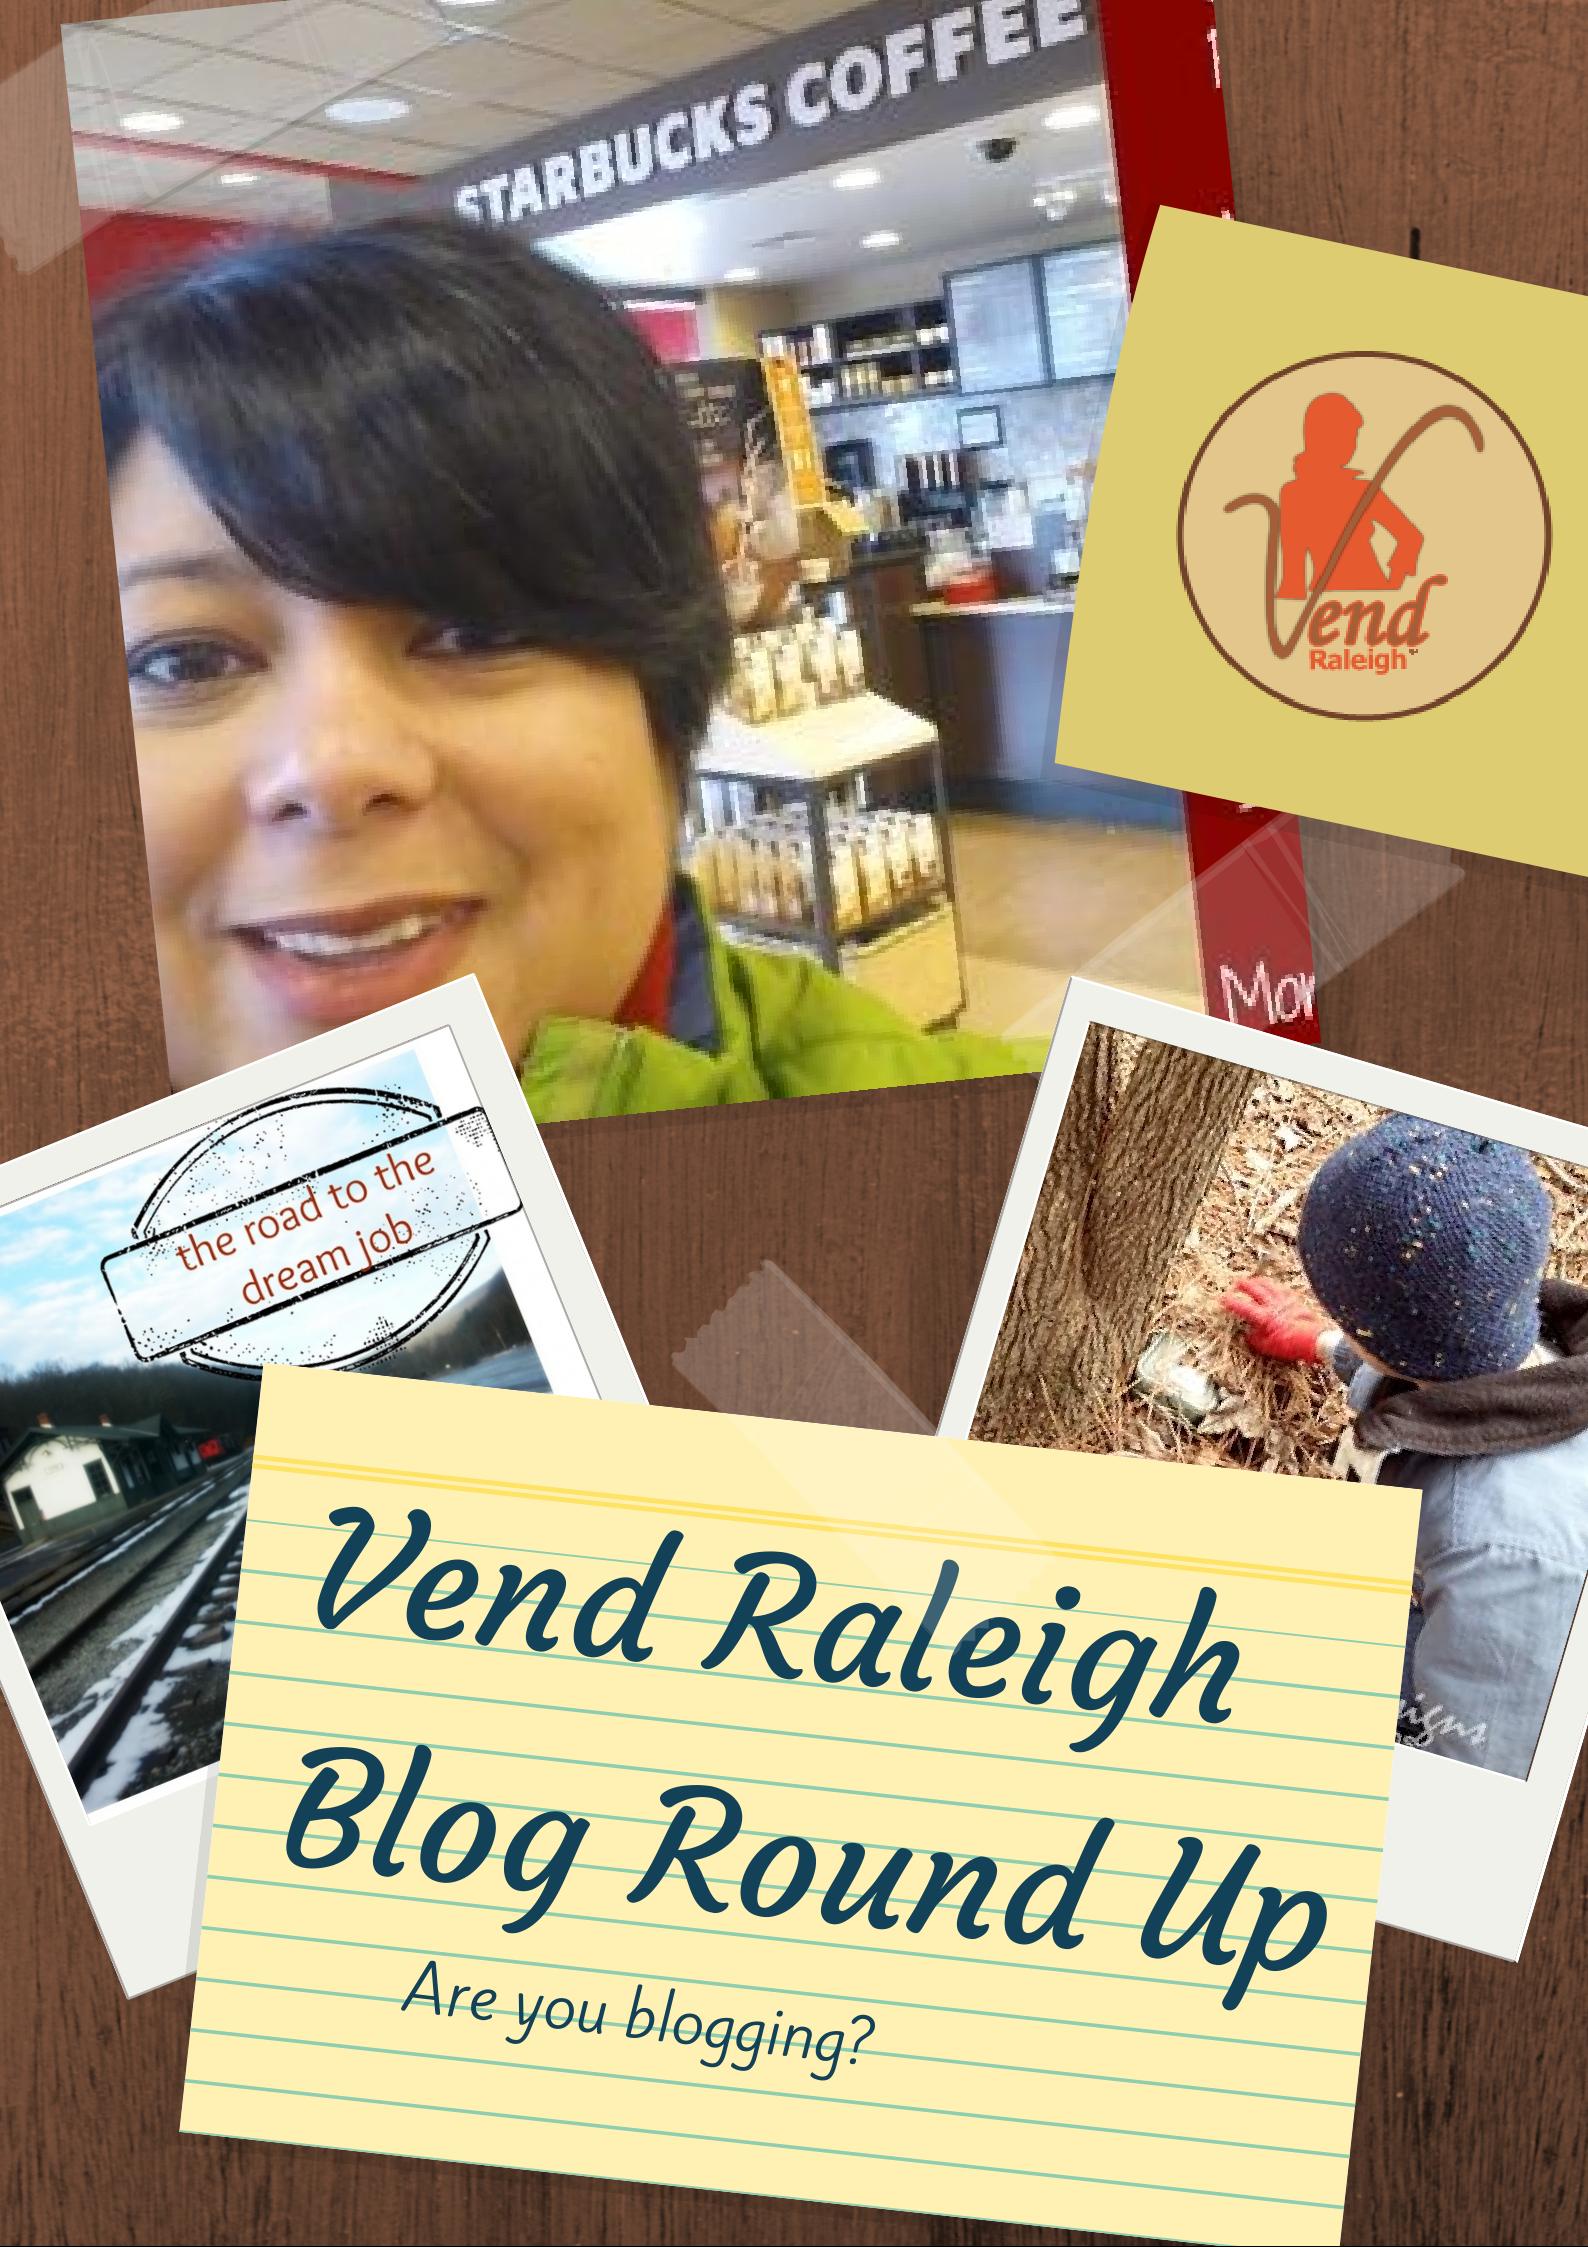 Raleigh Small Business Blogs, Raleigh Small Business Women